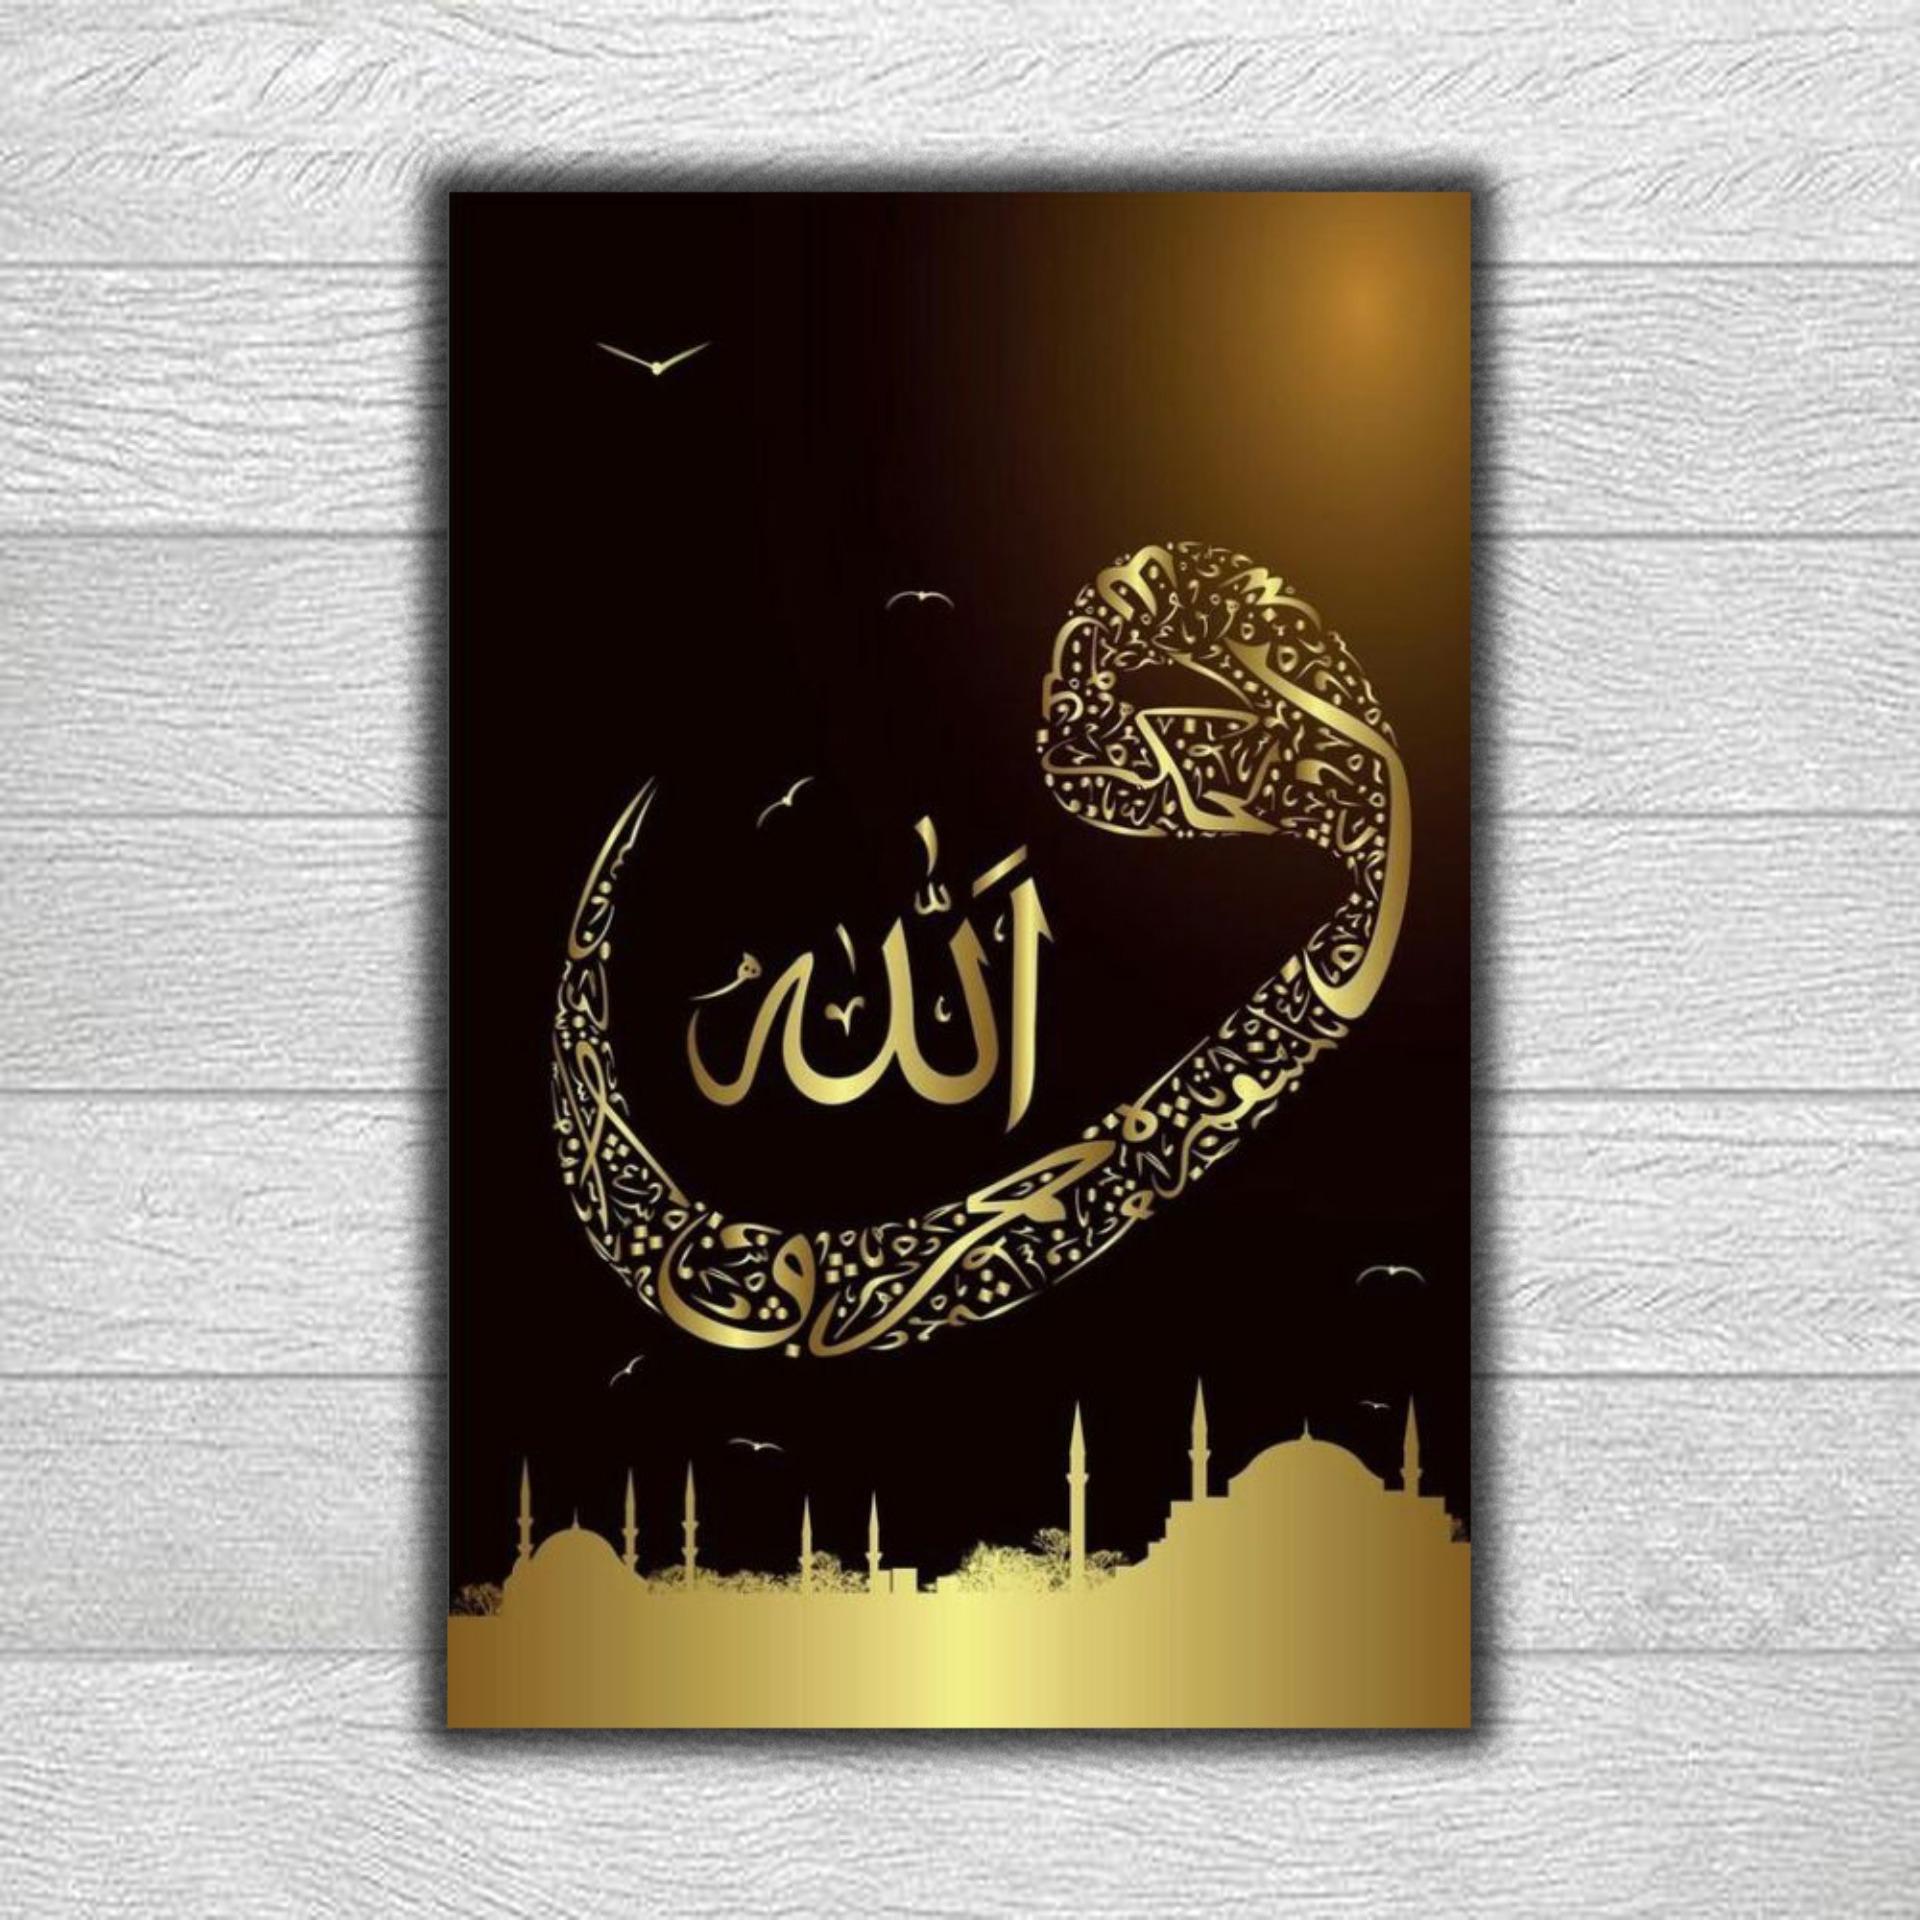 Poster Foil Emas: Asmaul Husna #FO33 - 38 x 58 cm. Source ·